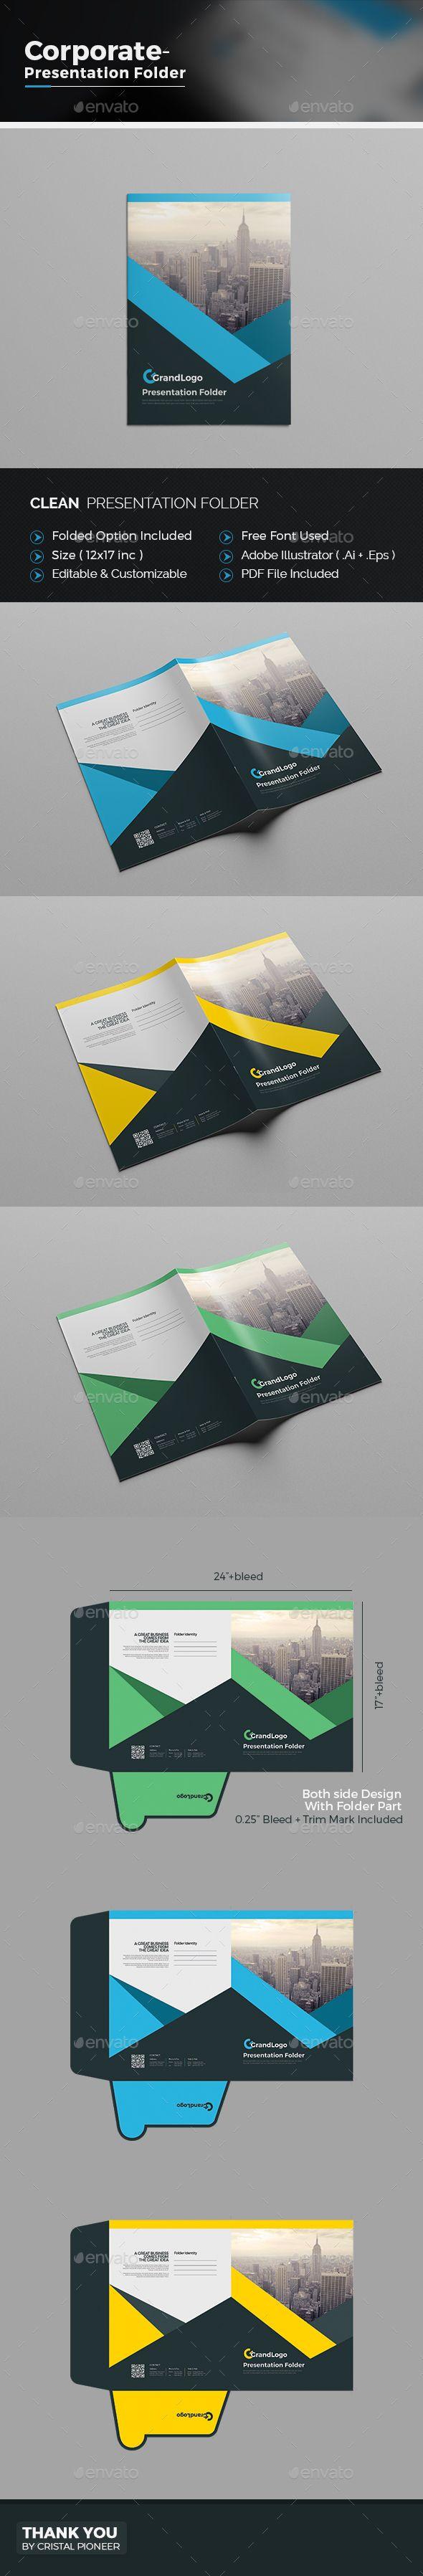 Business Presentation Folder | Pinterest